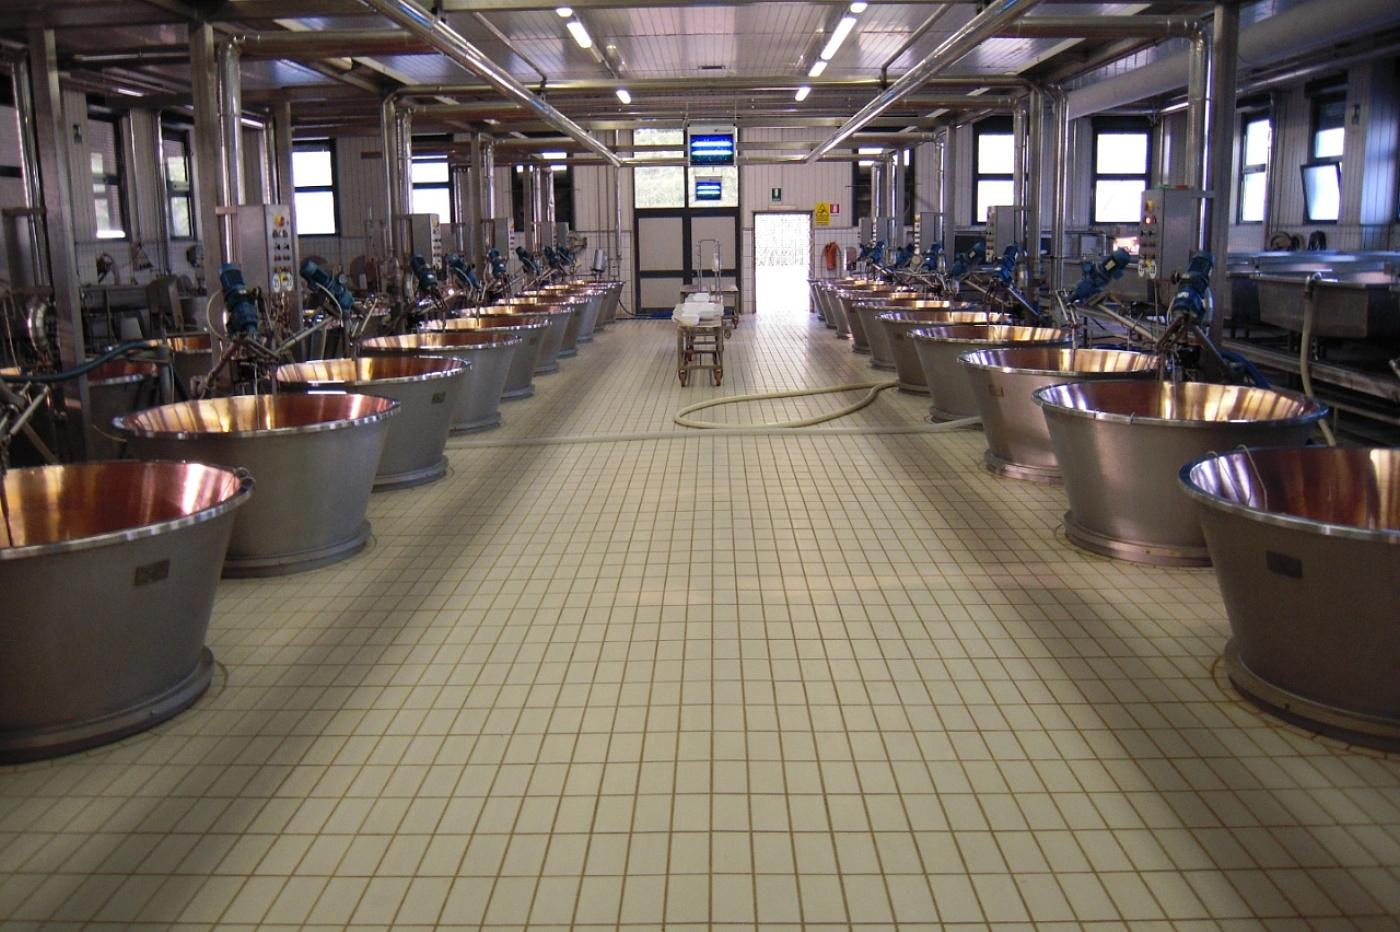 Real srl  KLINKER pavimentazioni per lindustria alimentare   TrovaPavimentiit